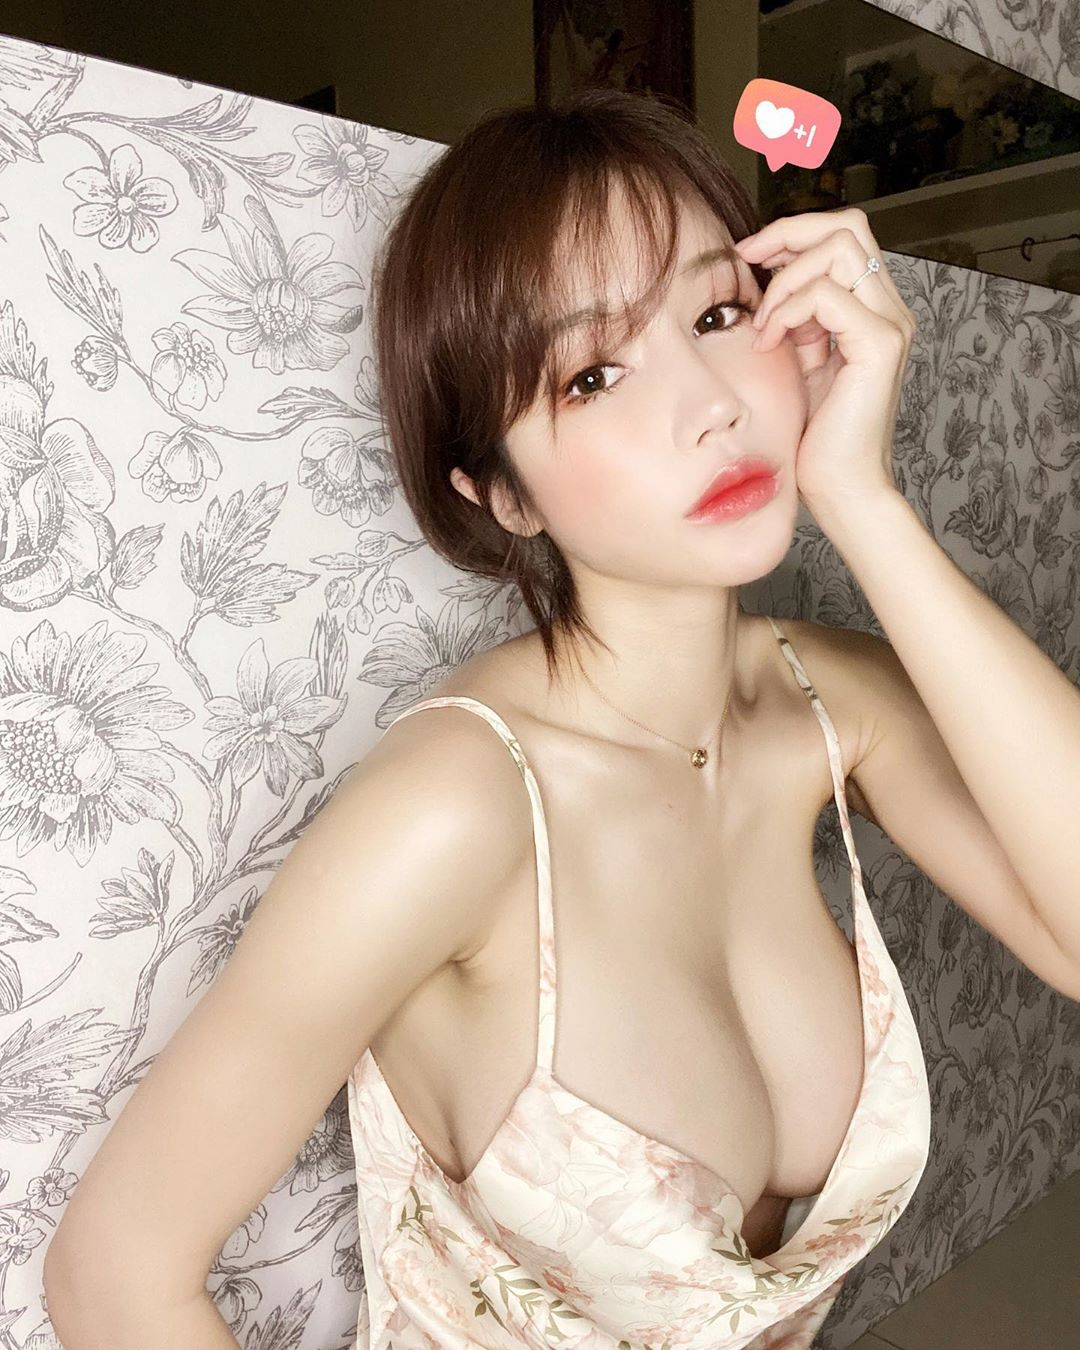 yui_xin__100931307_590247104957267_39320401117773003_n.jpg